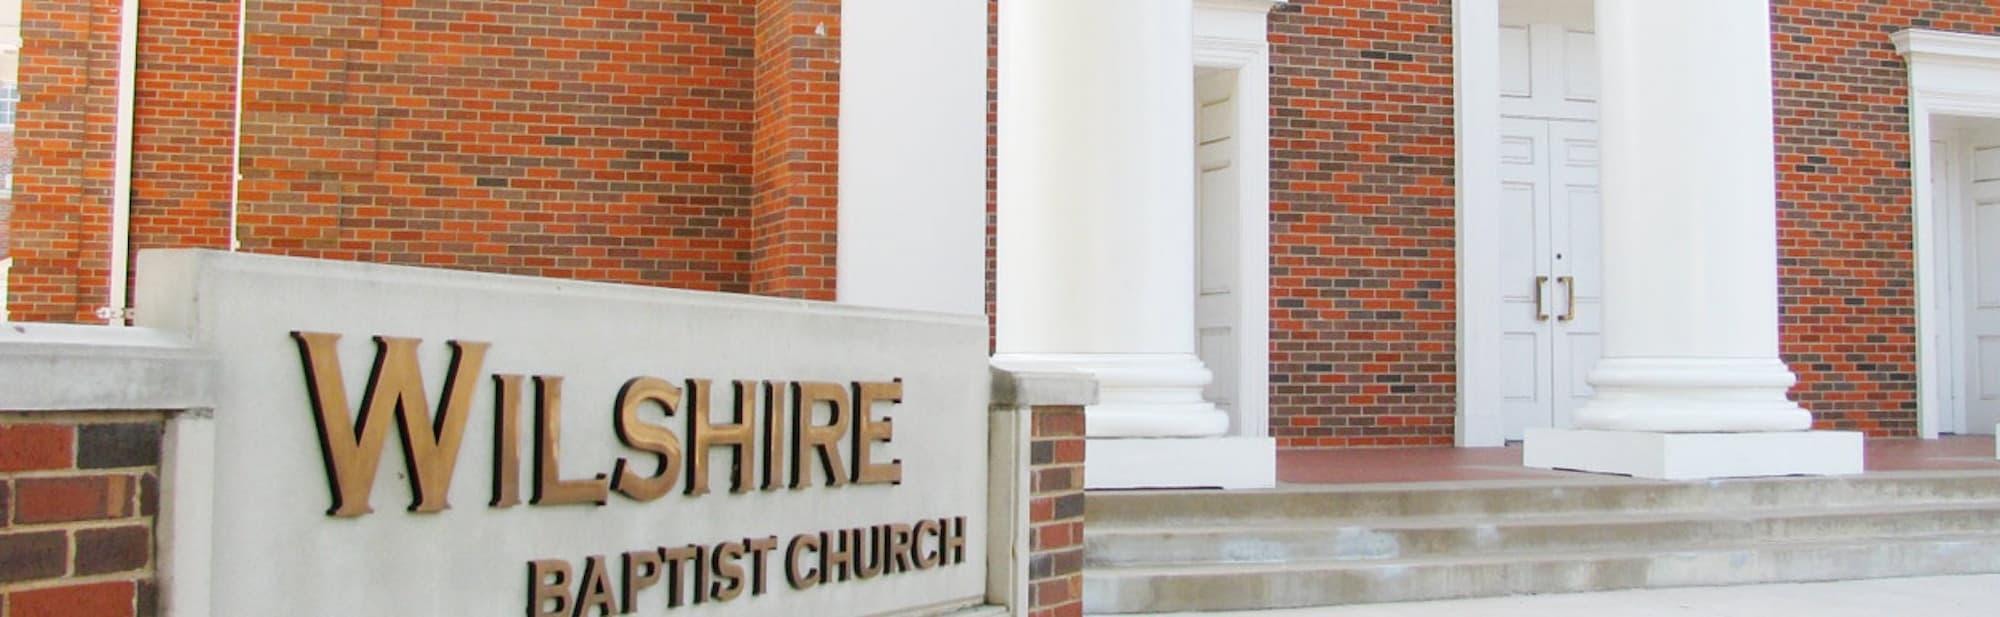 Administrative Staff Wilshire Baptist Church Dallas Tx